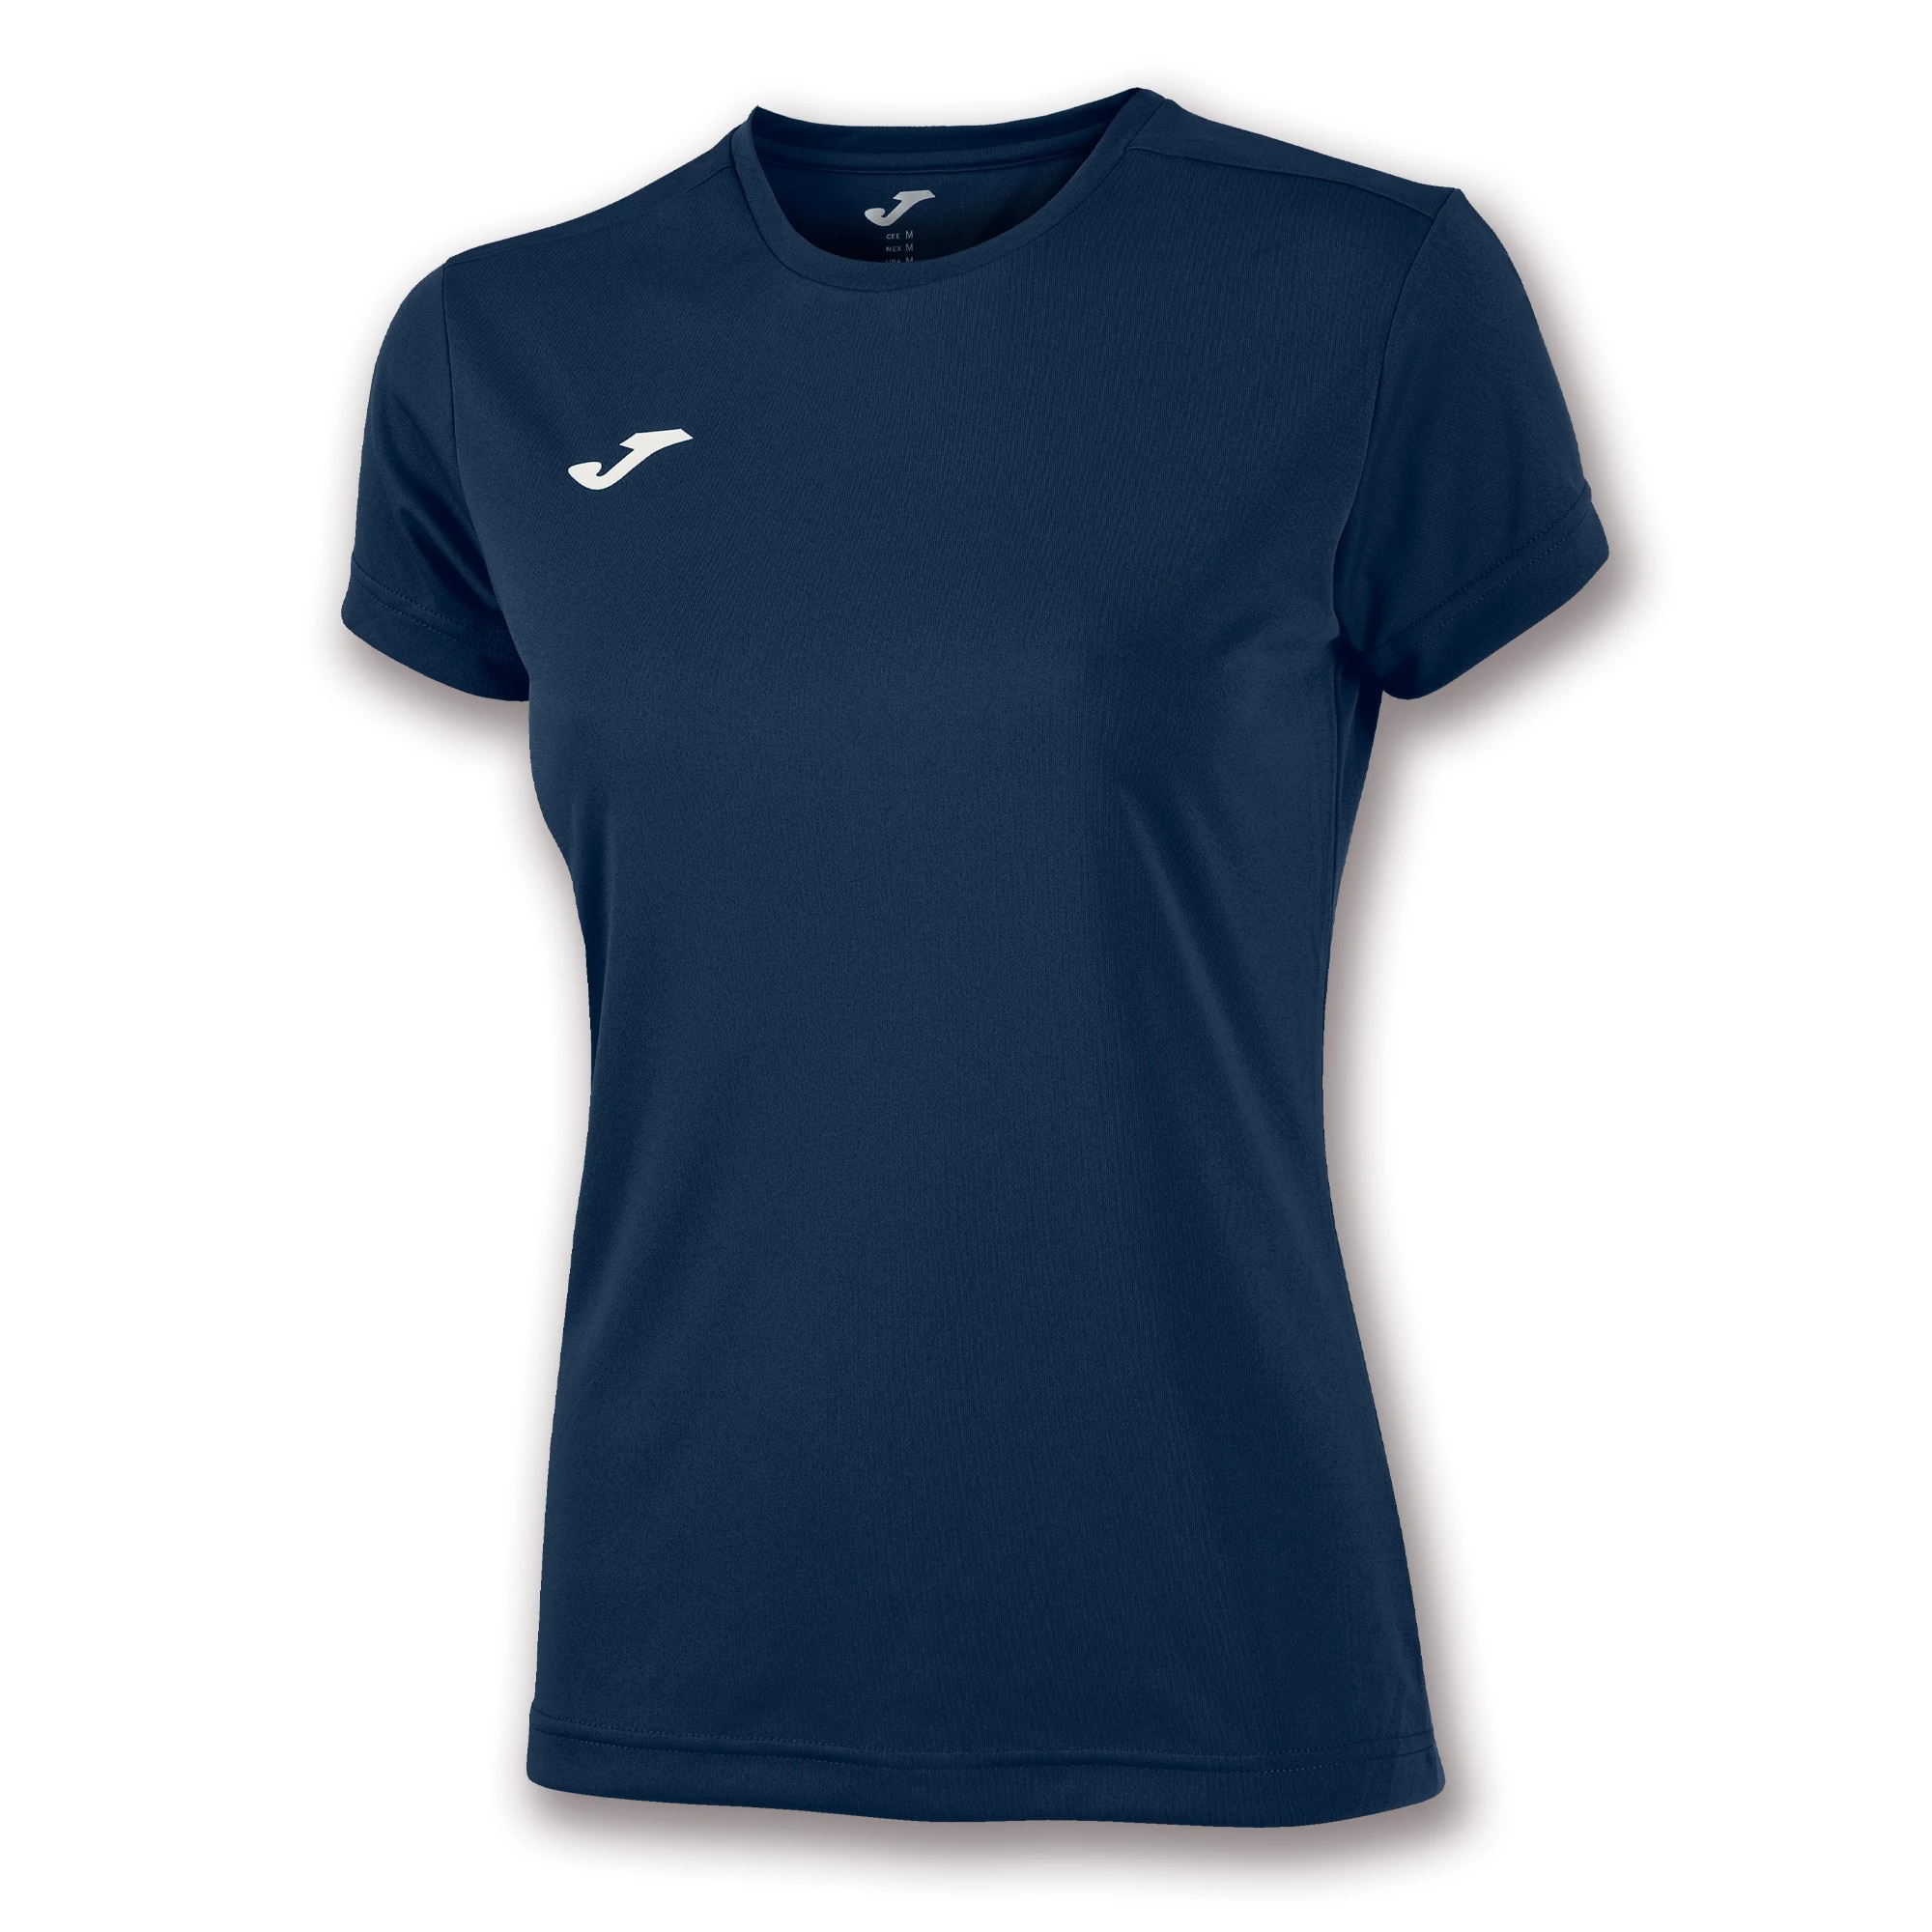 COMBI camiseta JOMA de 900248